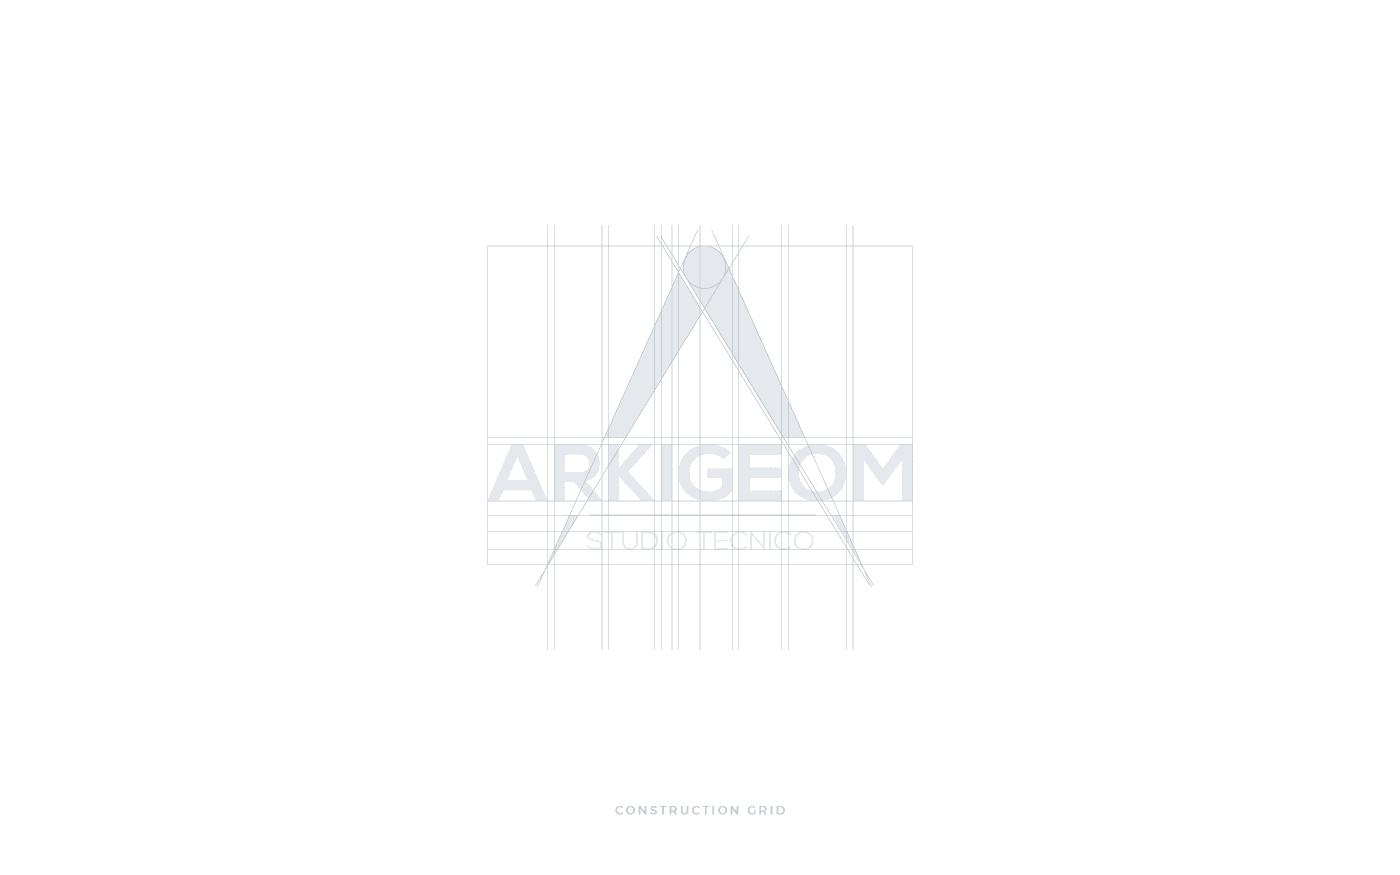 Studio tecnico Arkigeom griglia costruzione logo